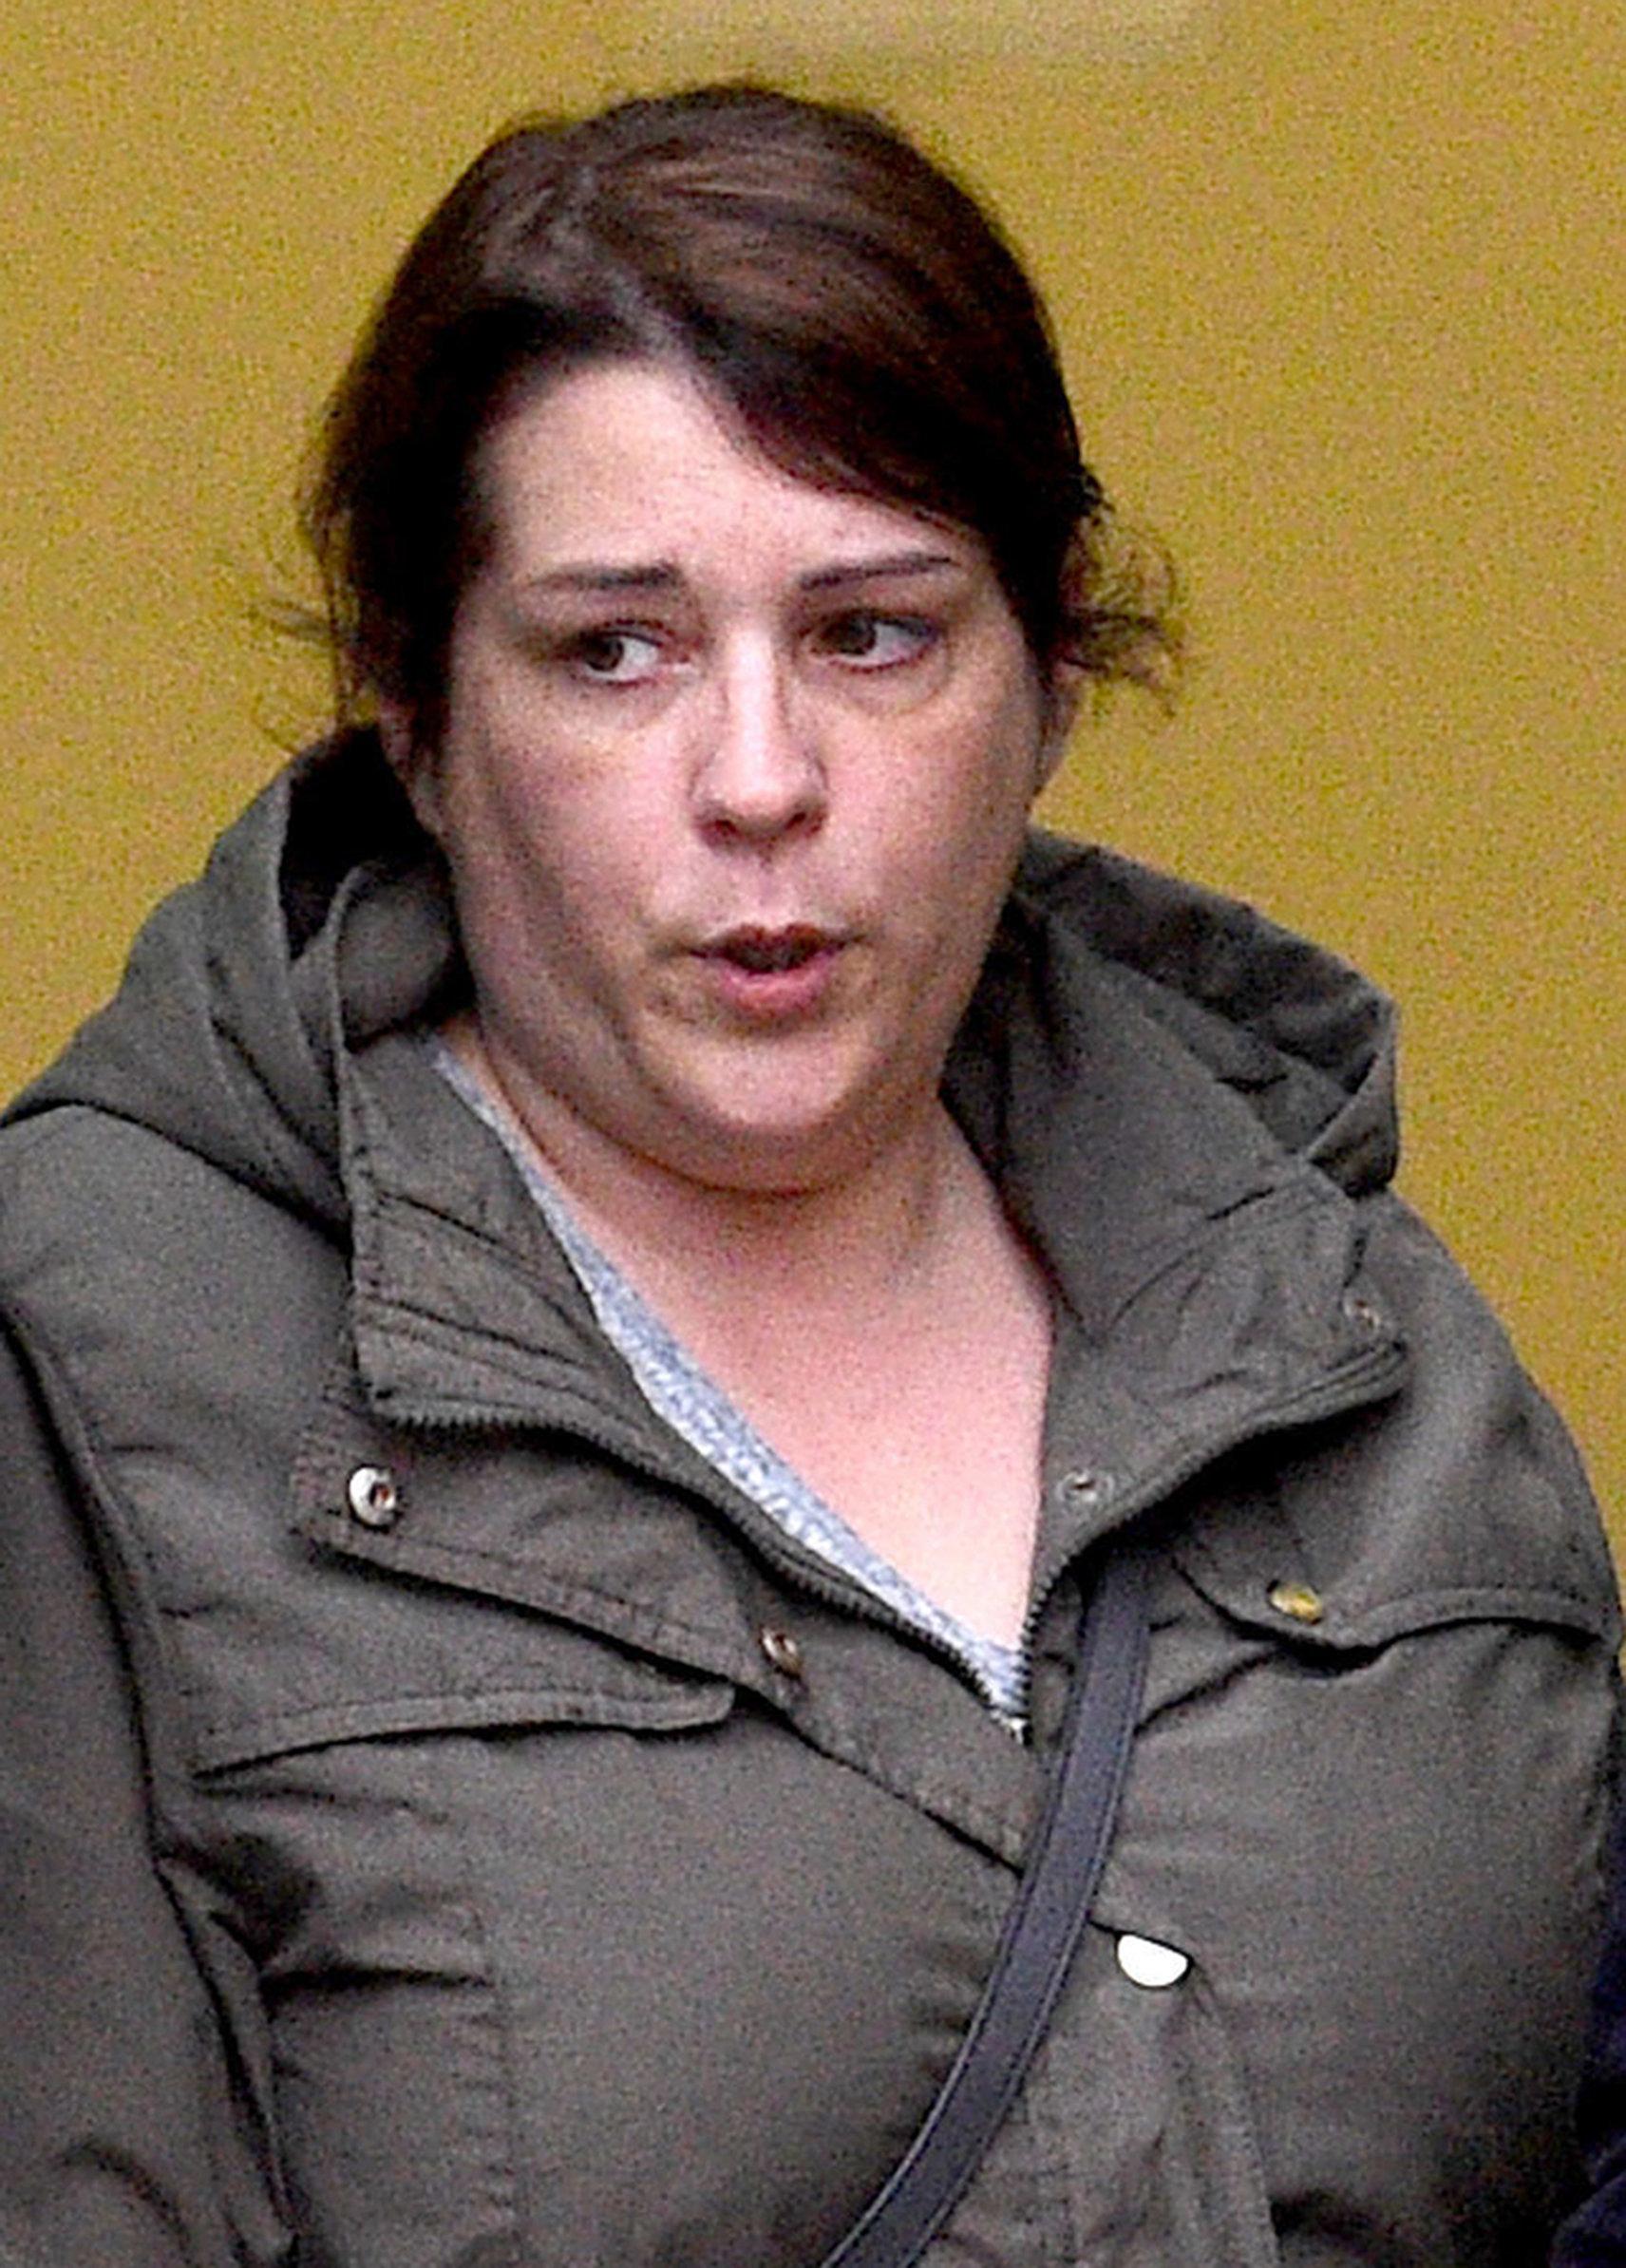 Grenfell Fraudster Who Splurged On Lavish Holidays 'Poured Salt On Victims'